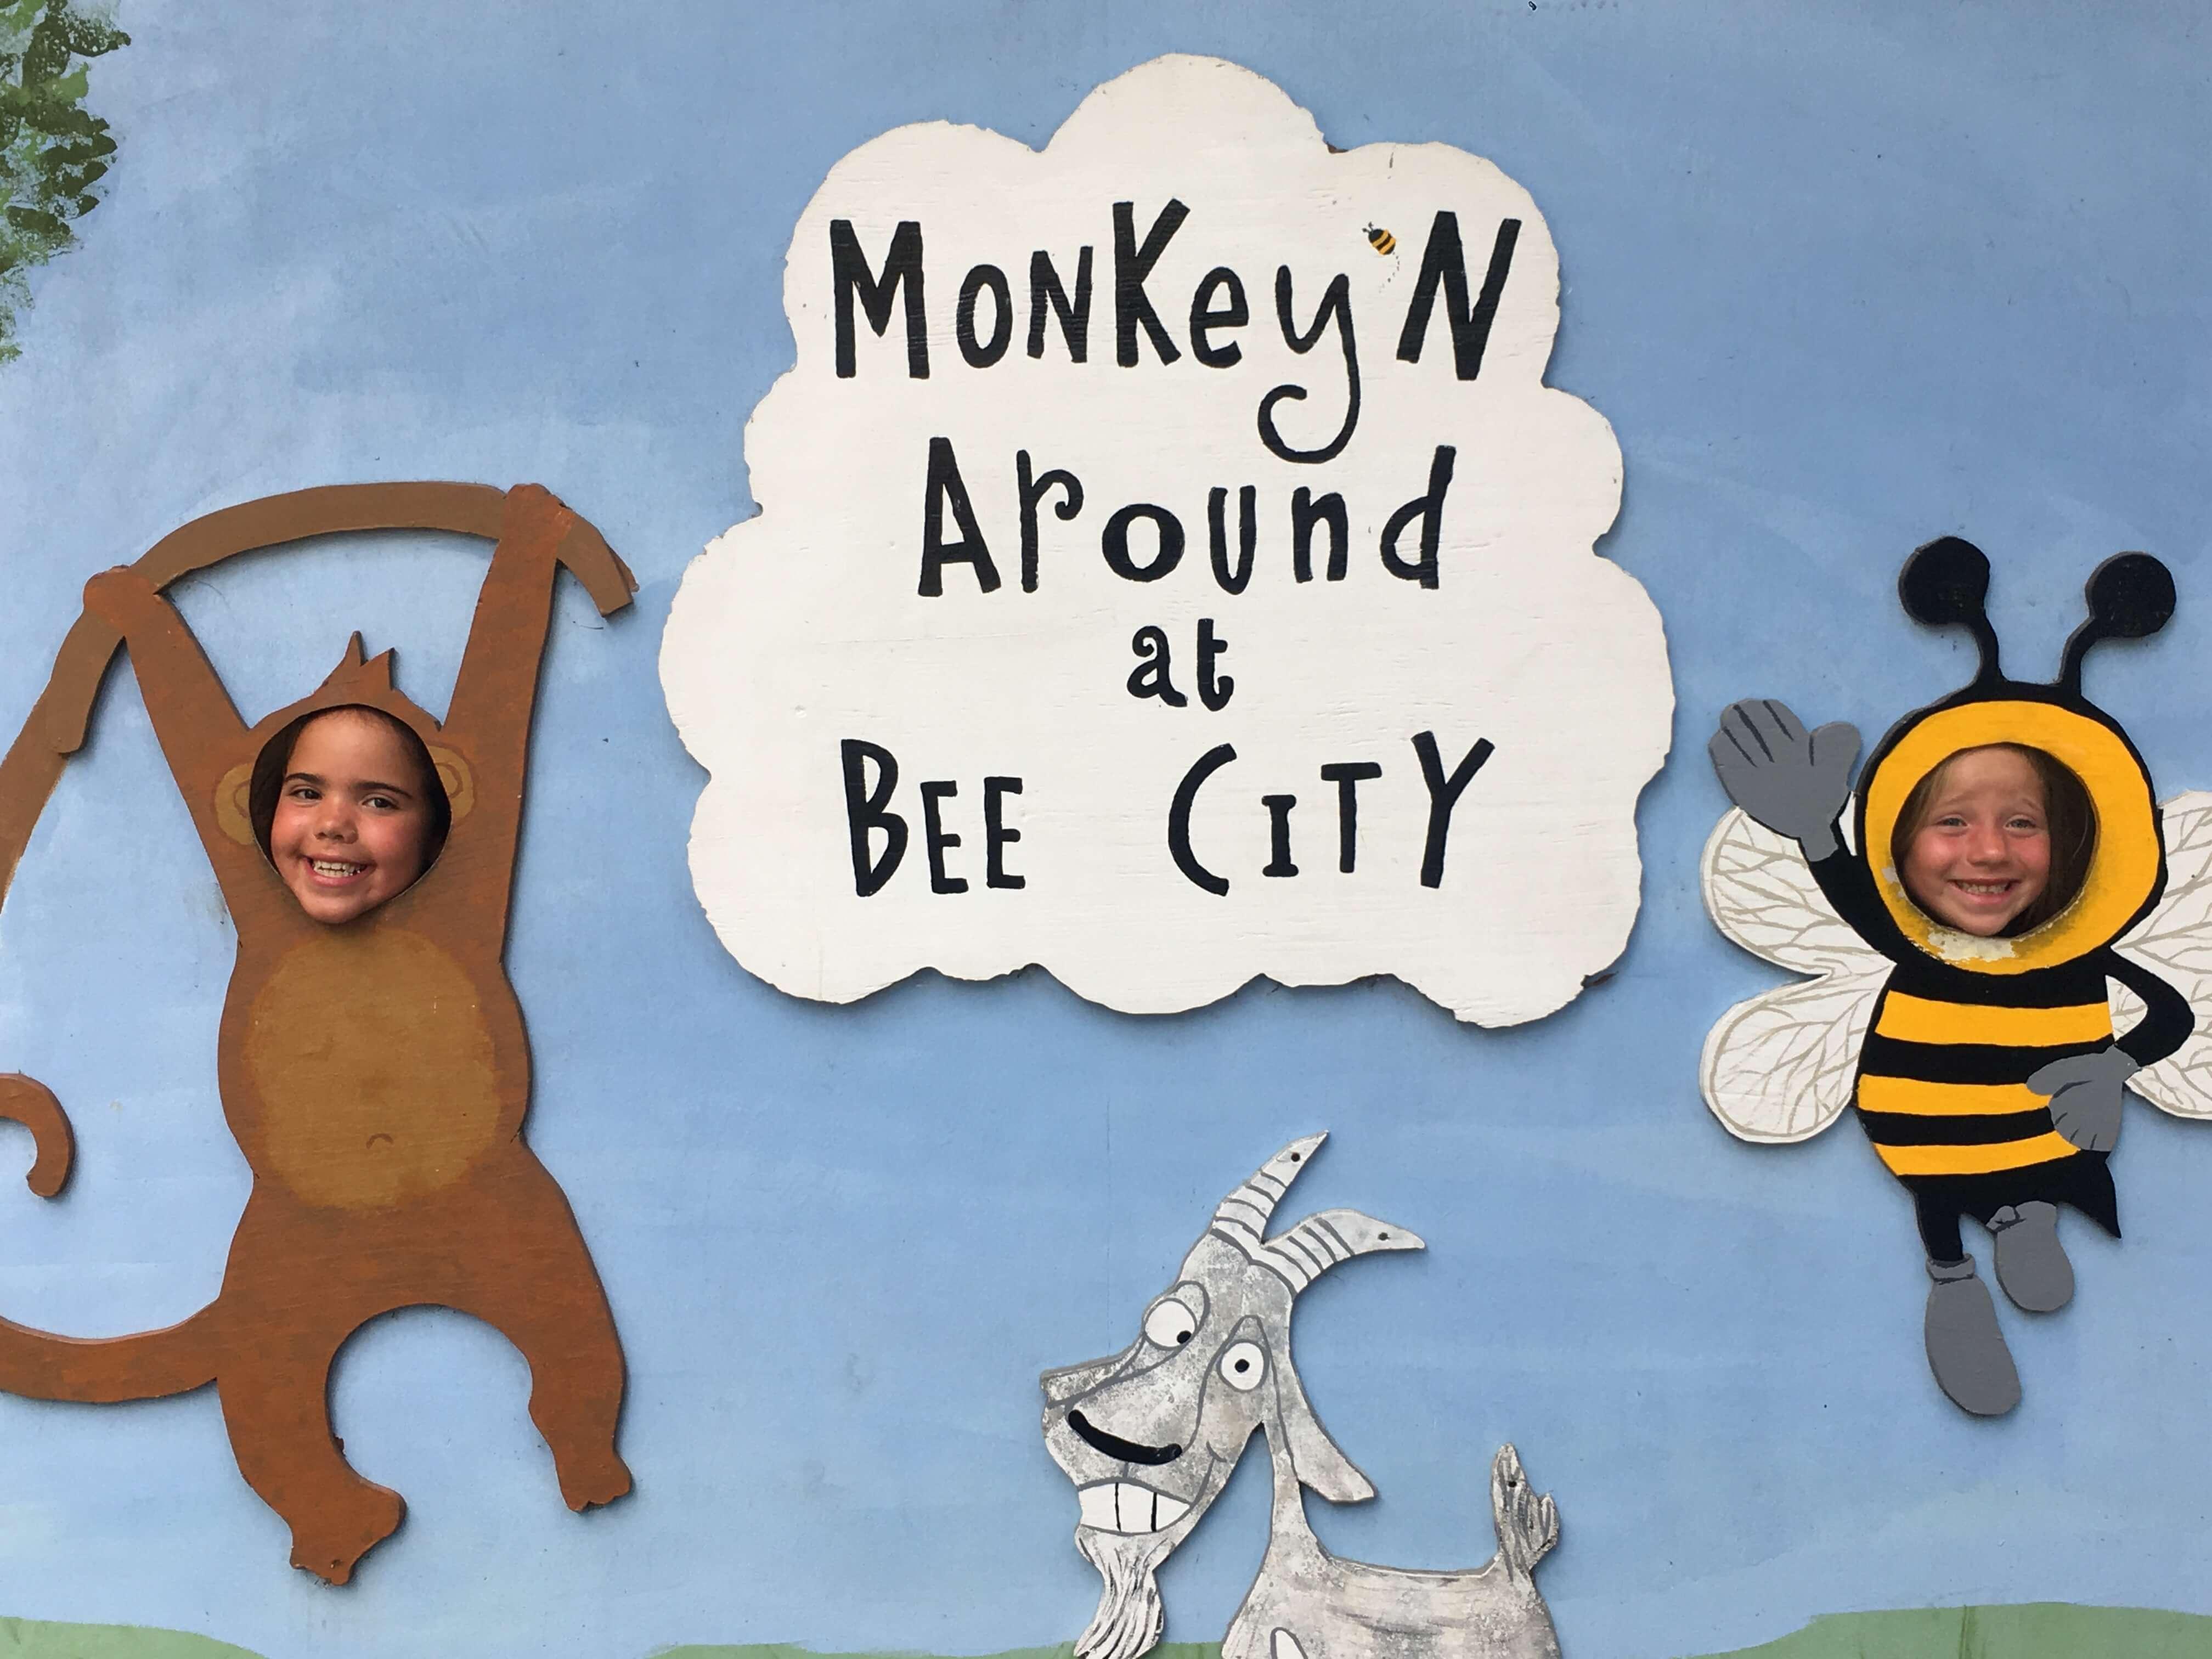 . Bee City Zoo charleston with kids feeding